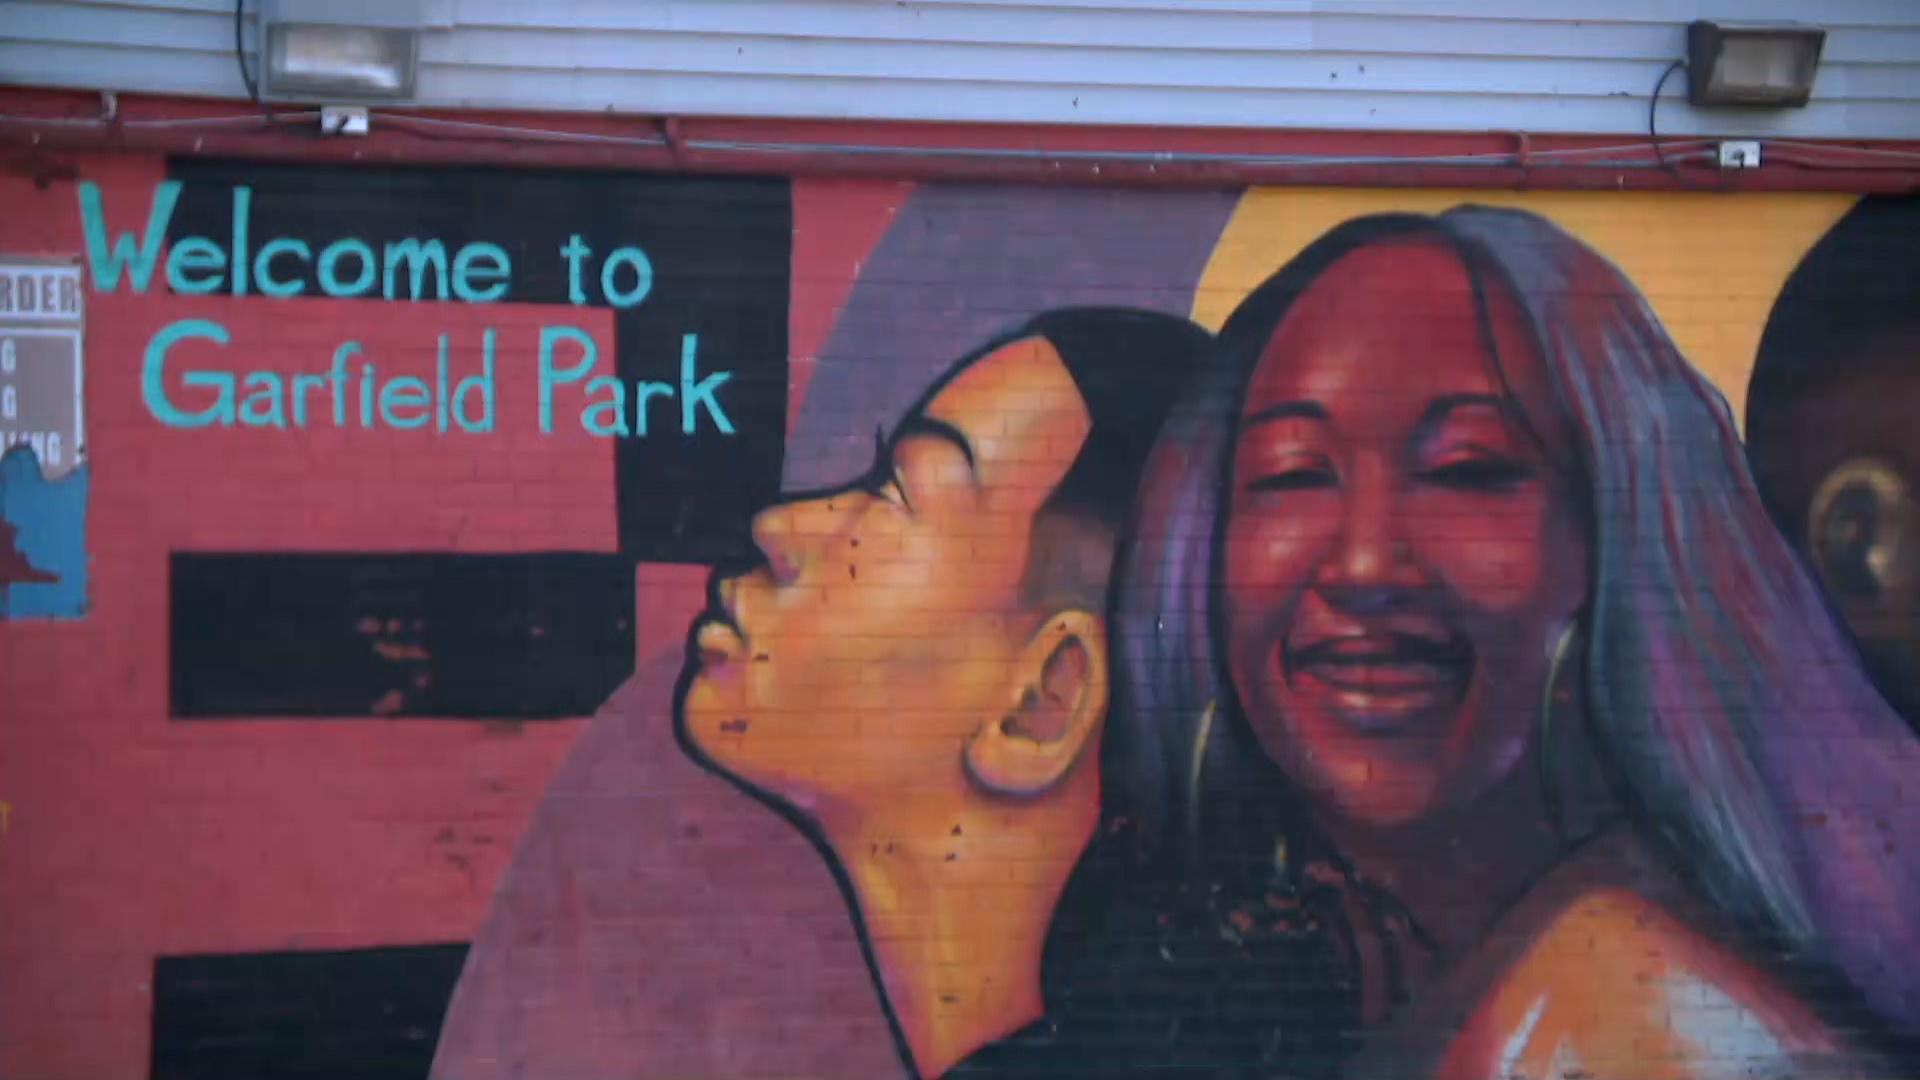 West garfield park hook up site officiel